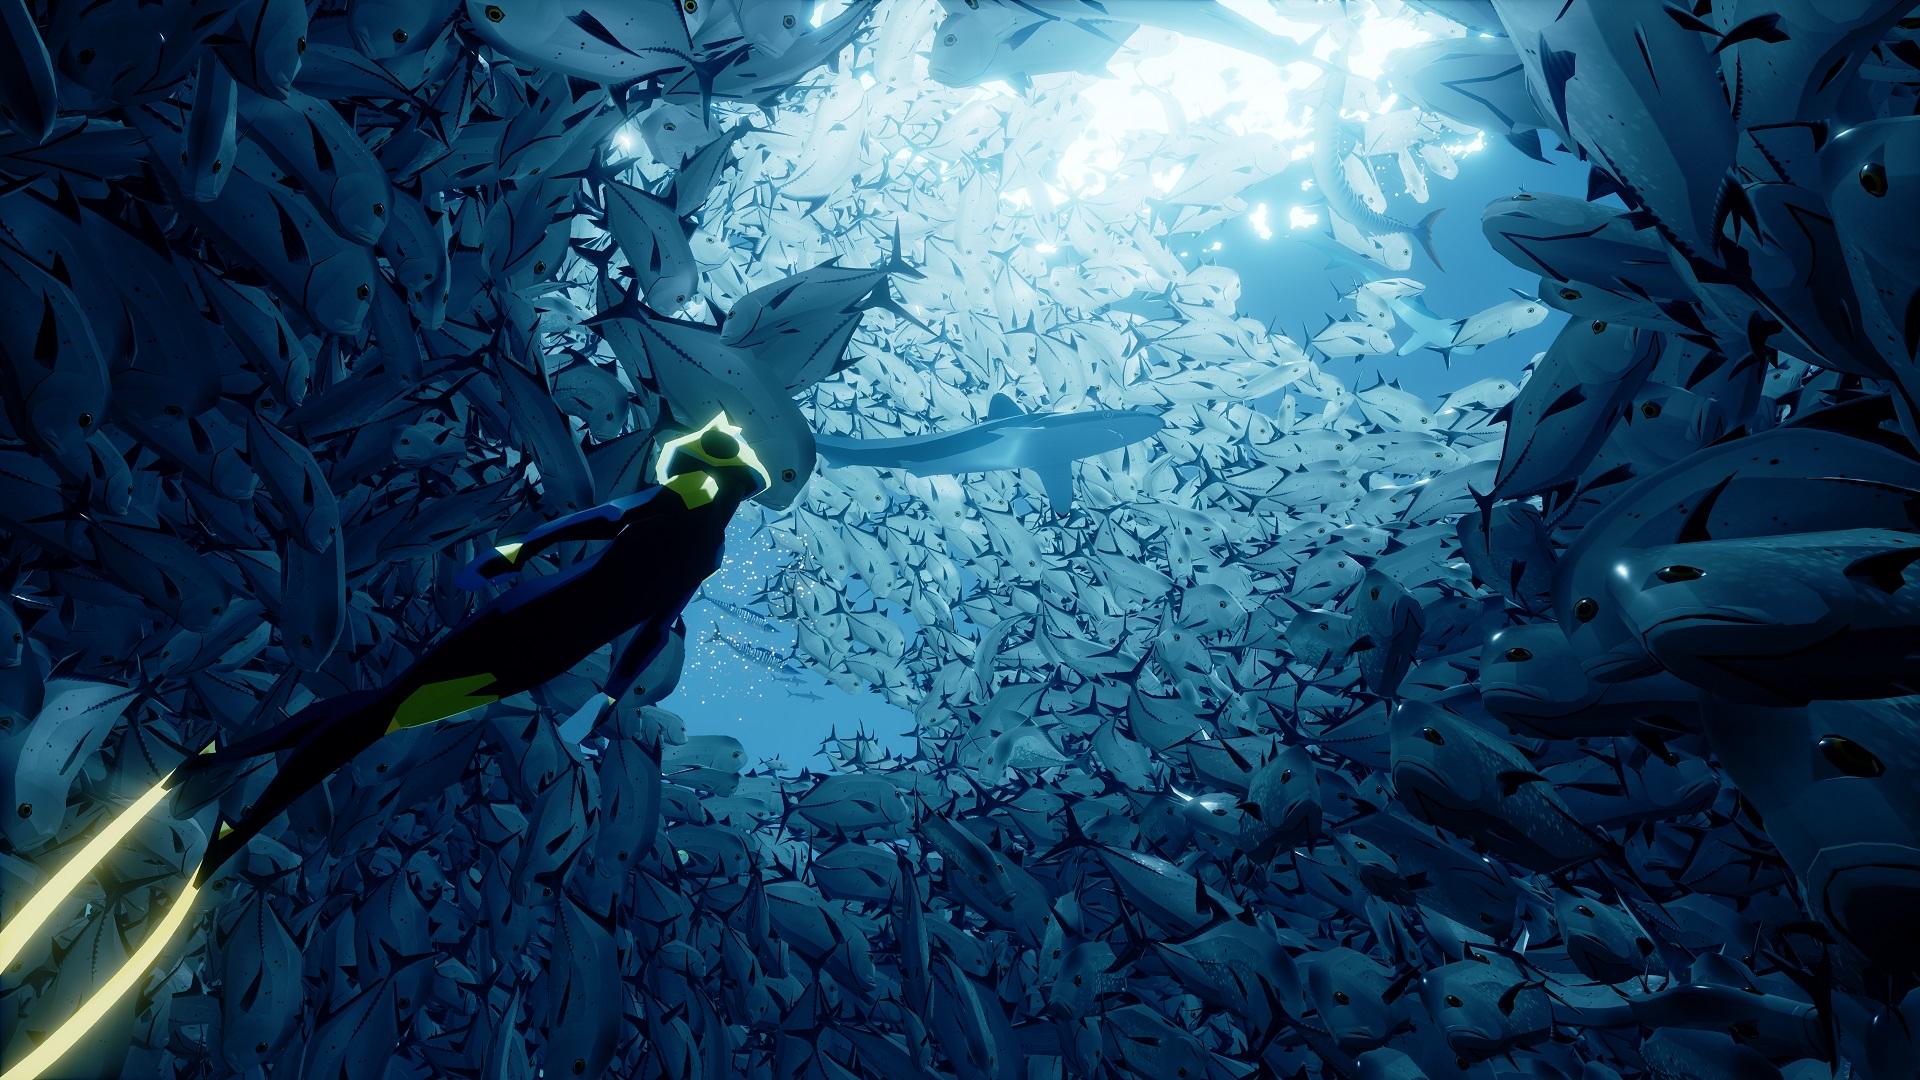 ABZU/智慧之海/海洋探索/深海探险-爱游·幻想